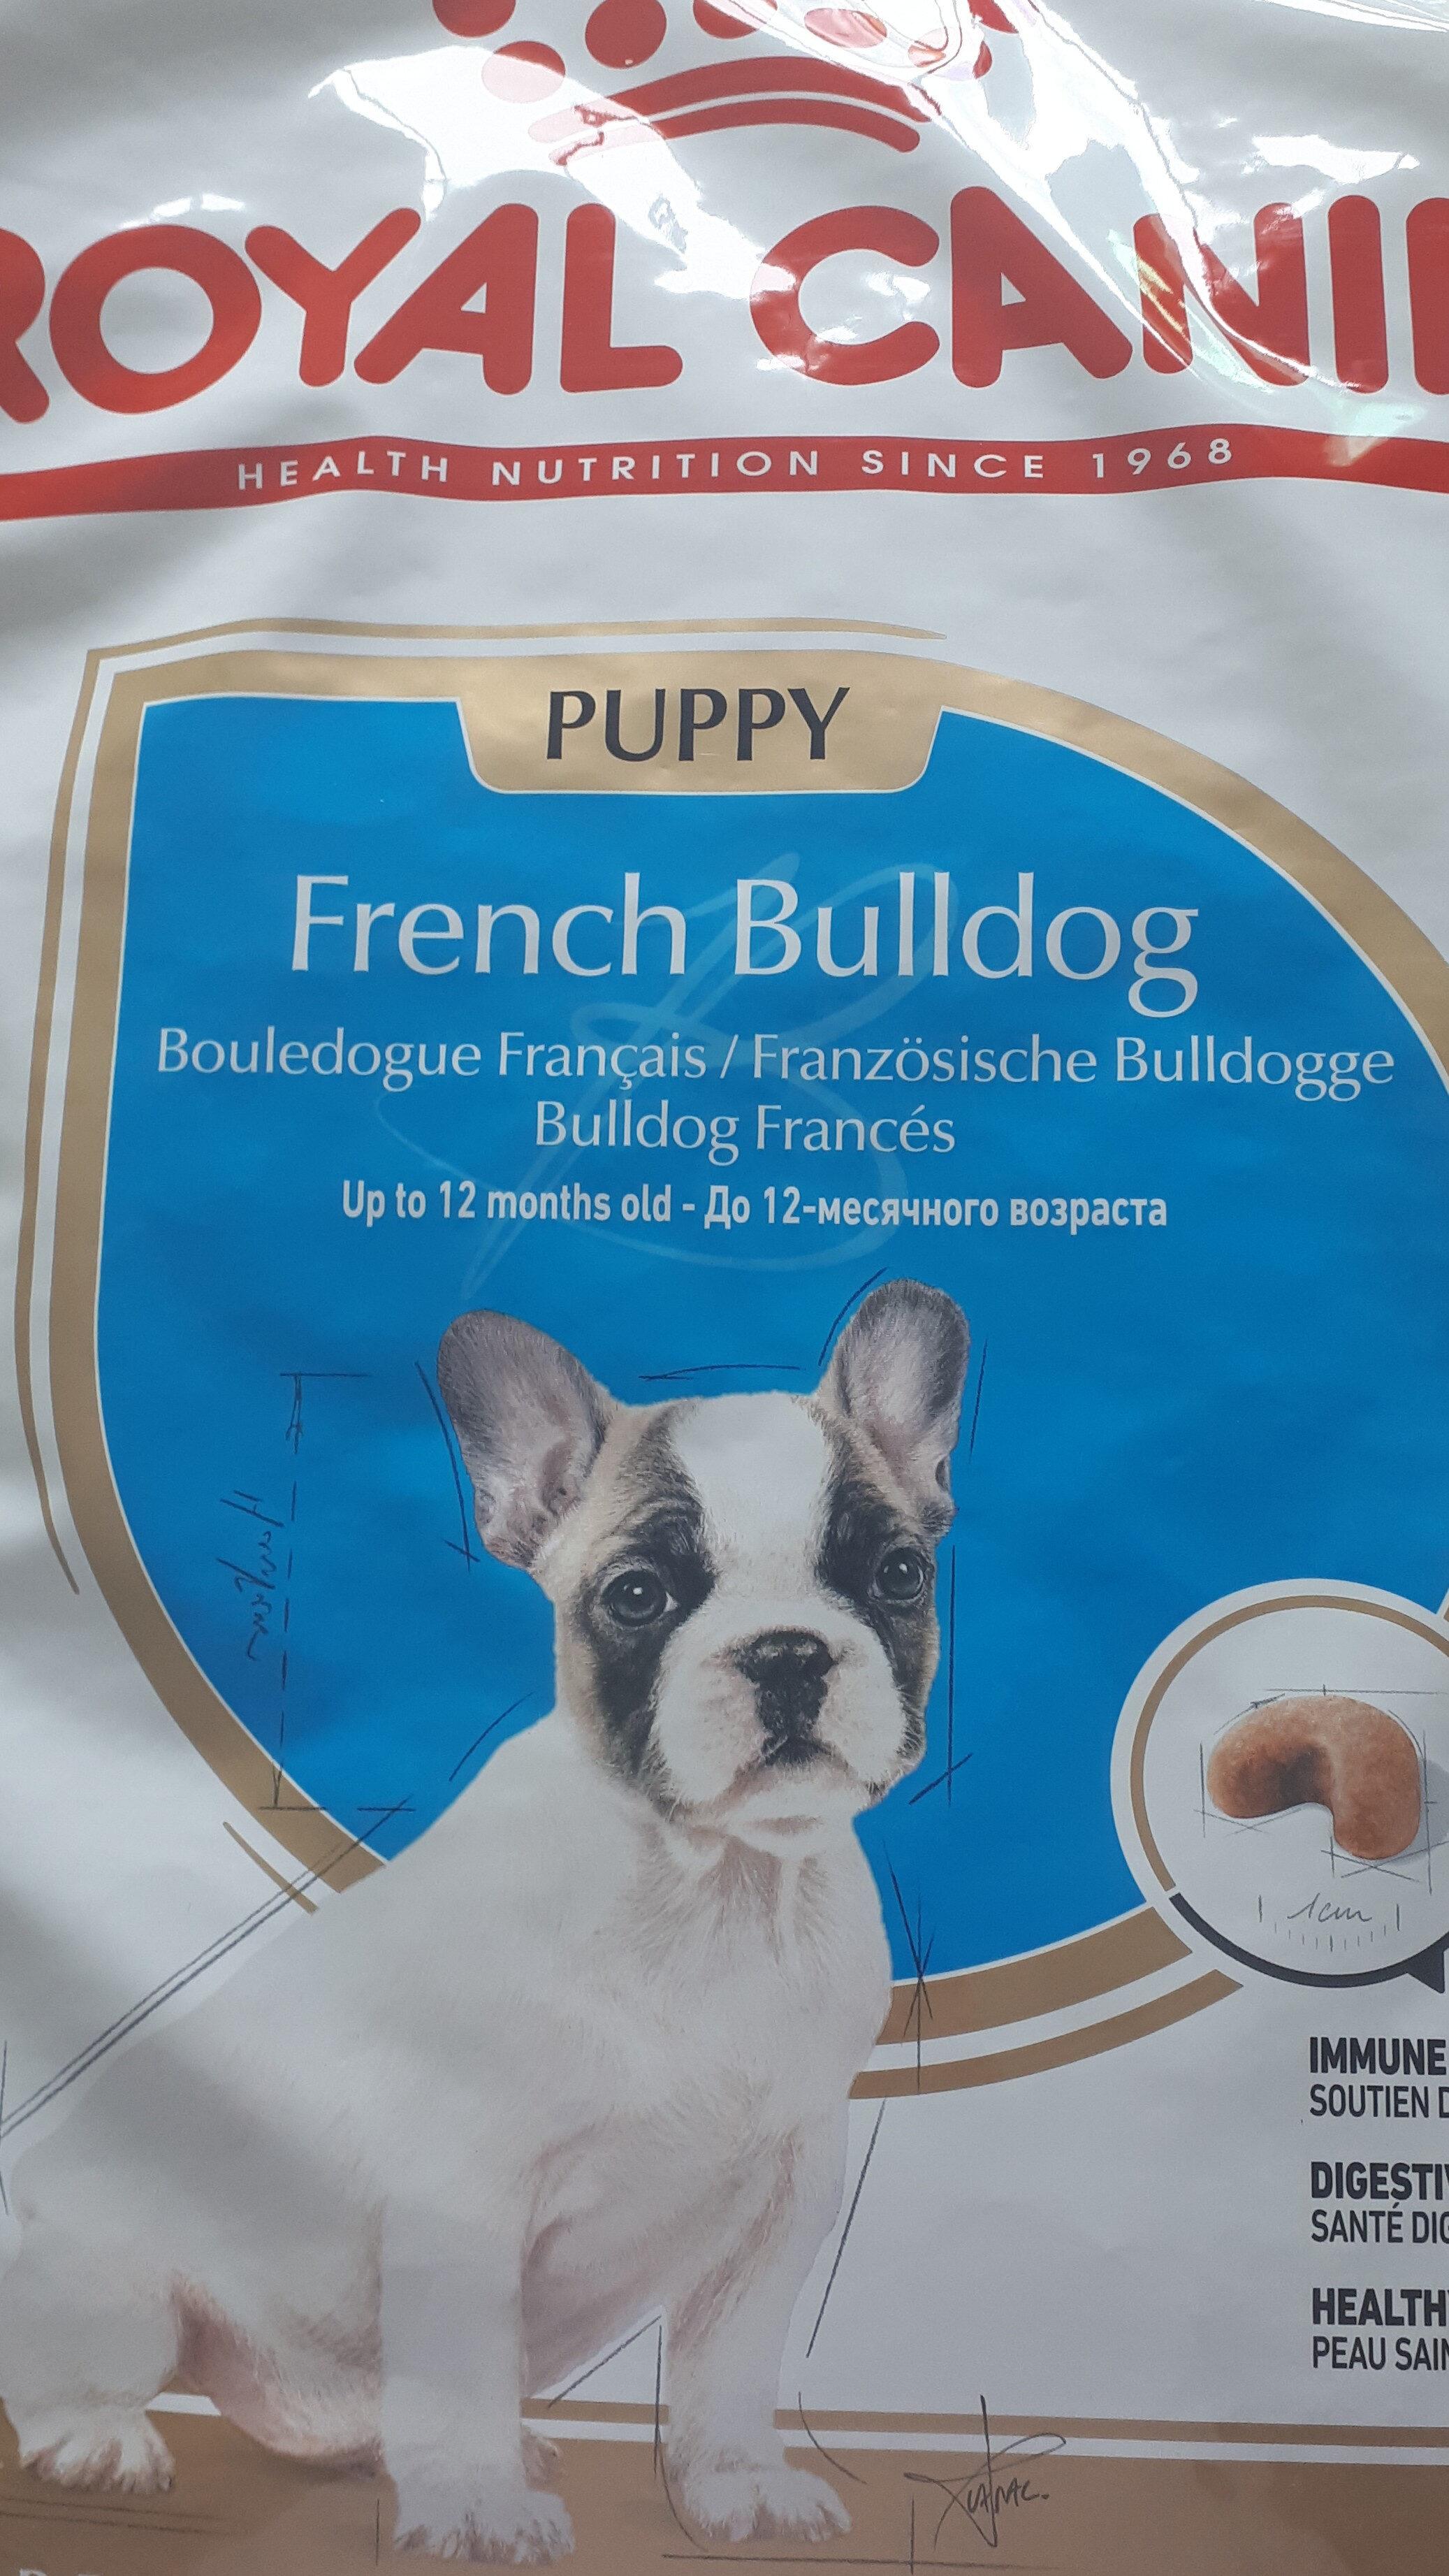 french bulldog - Product - fr